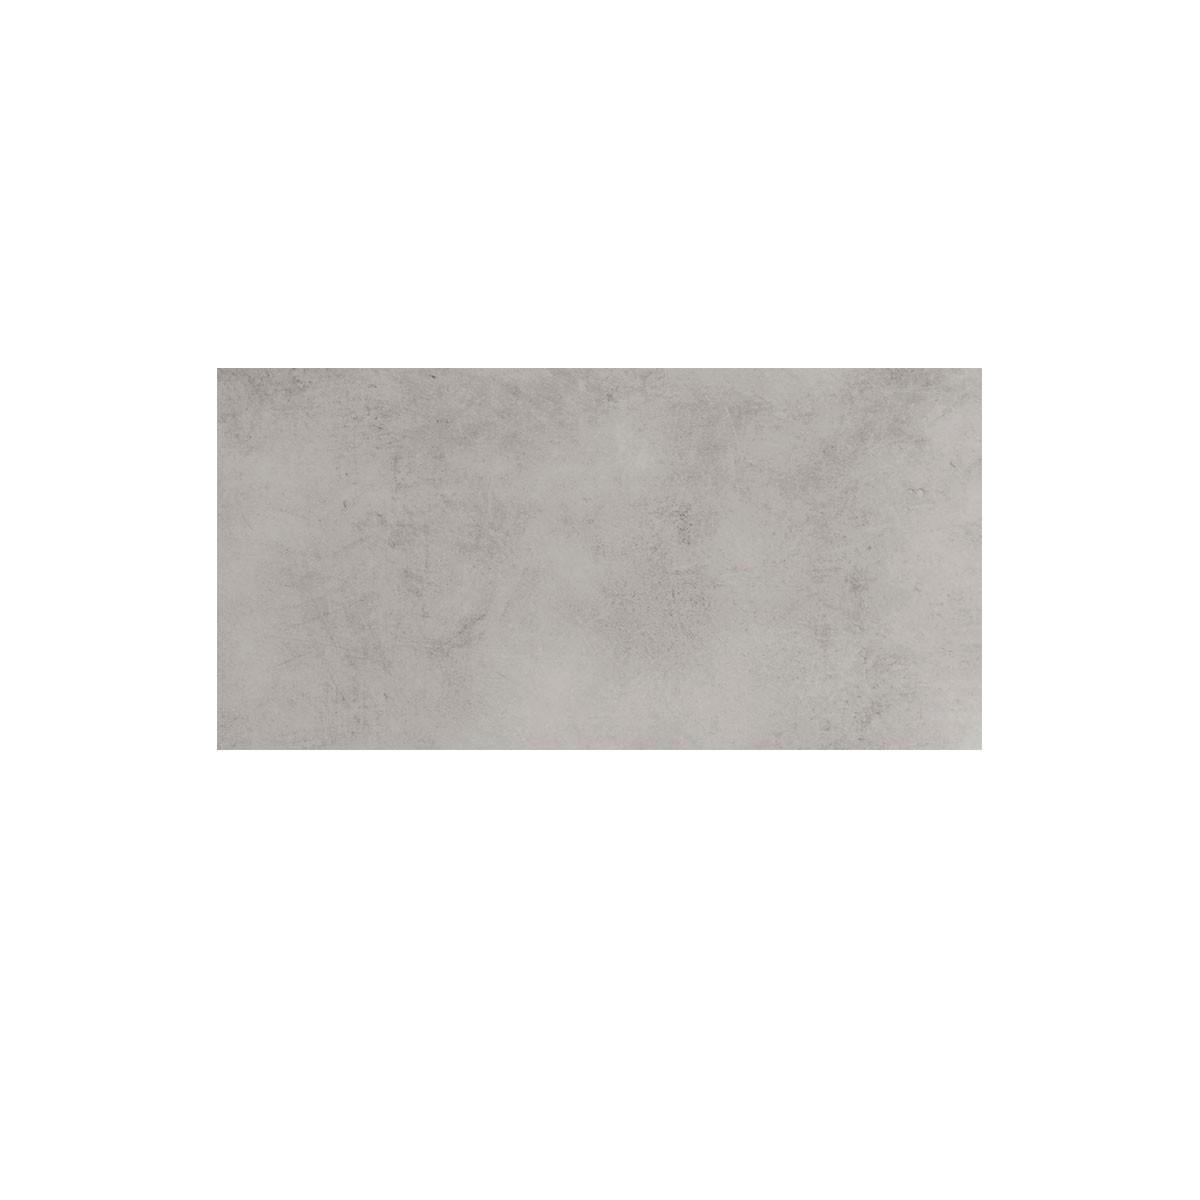 DECORAPORT NWS Wall Panel, Luxor Light, 4'' x6'' (NLS-01) (Sample)